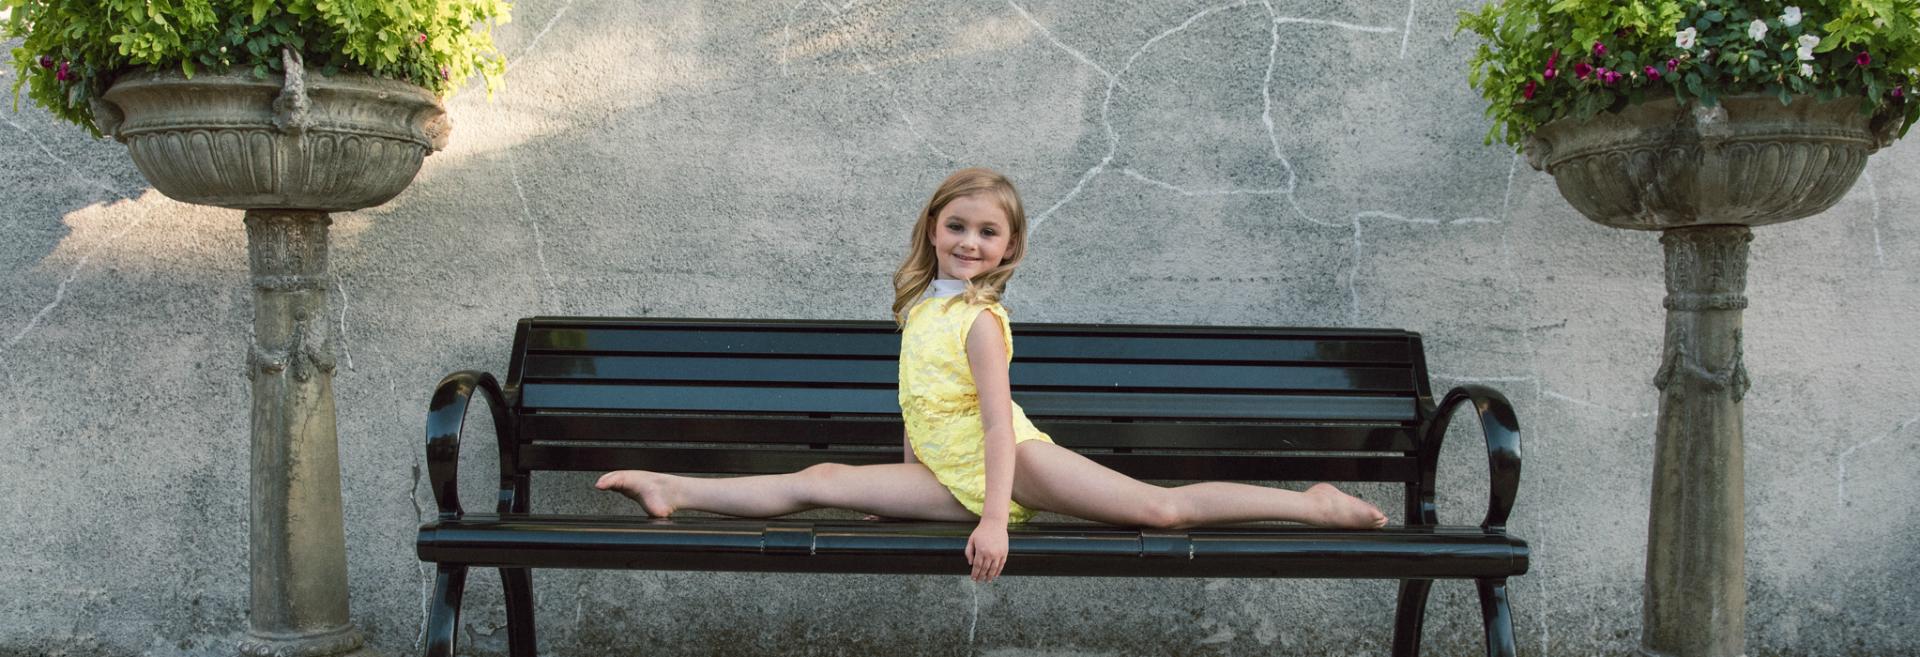 McKinney Dance Academy image 3